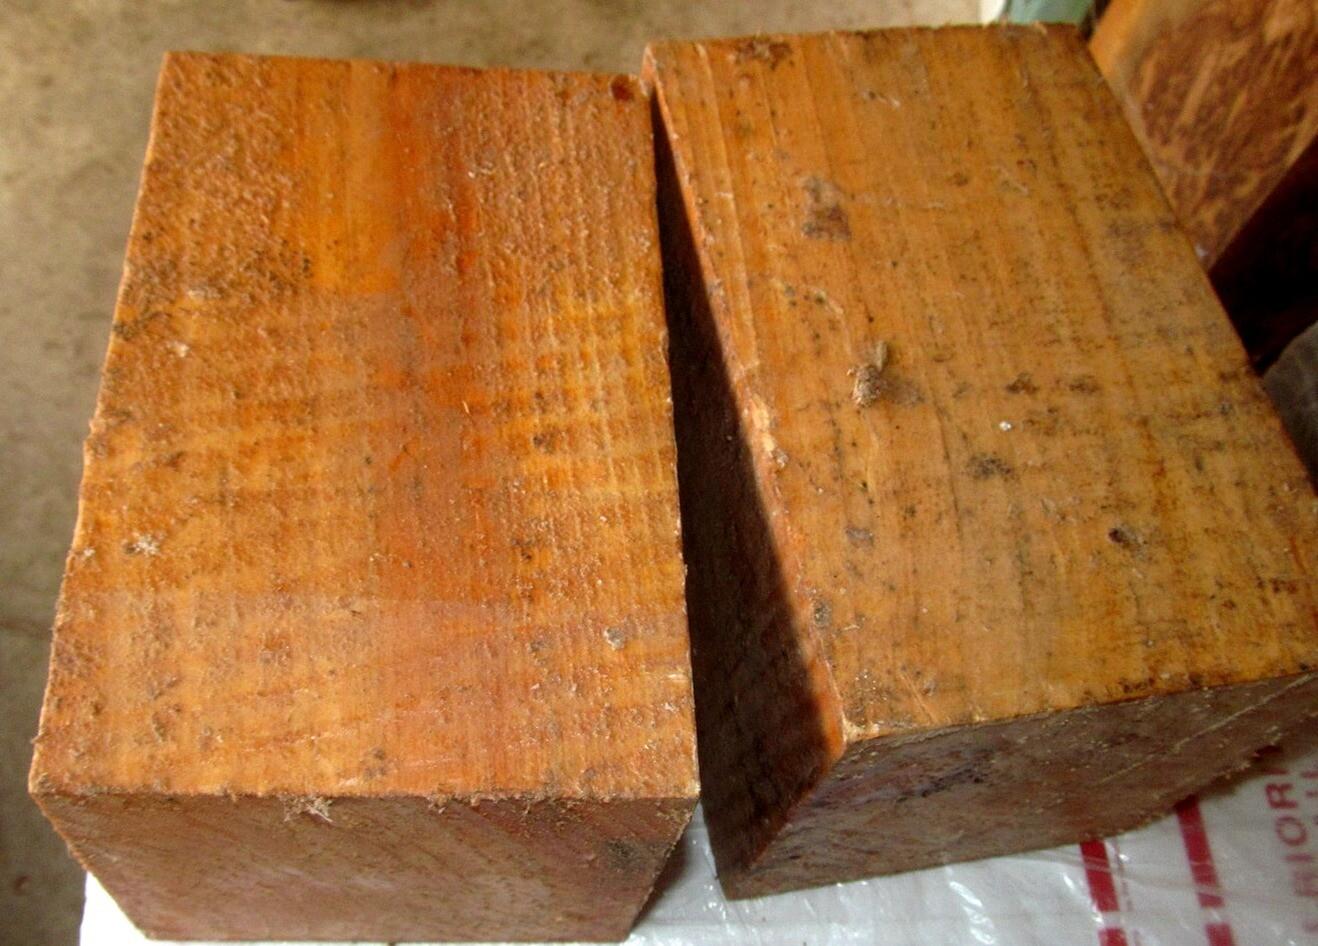 Two cypress 8x5x5